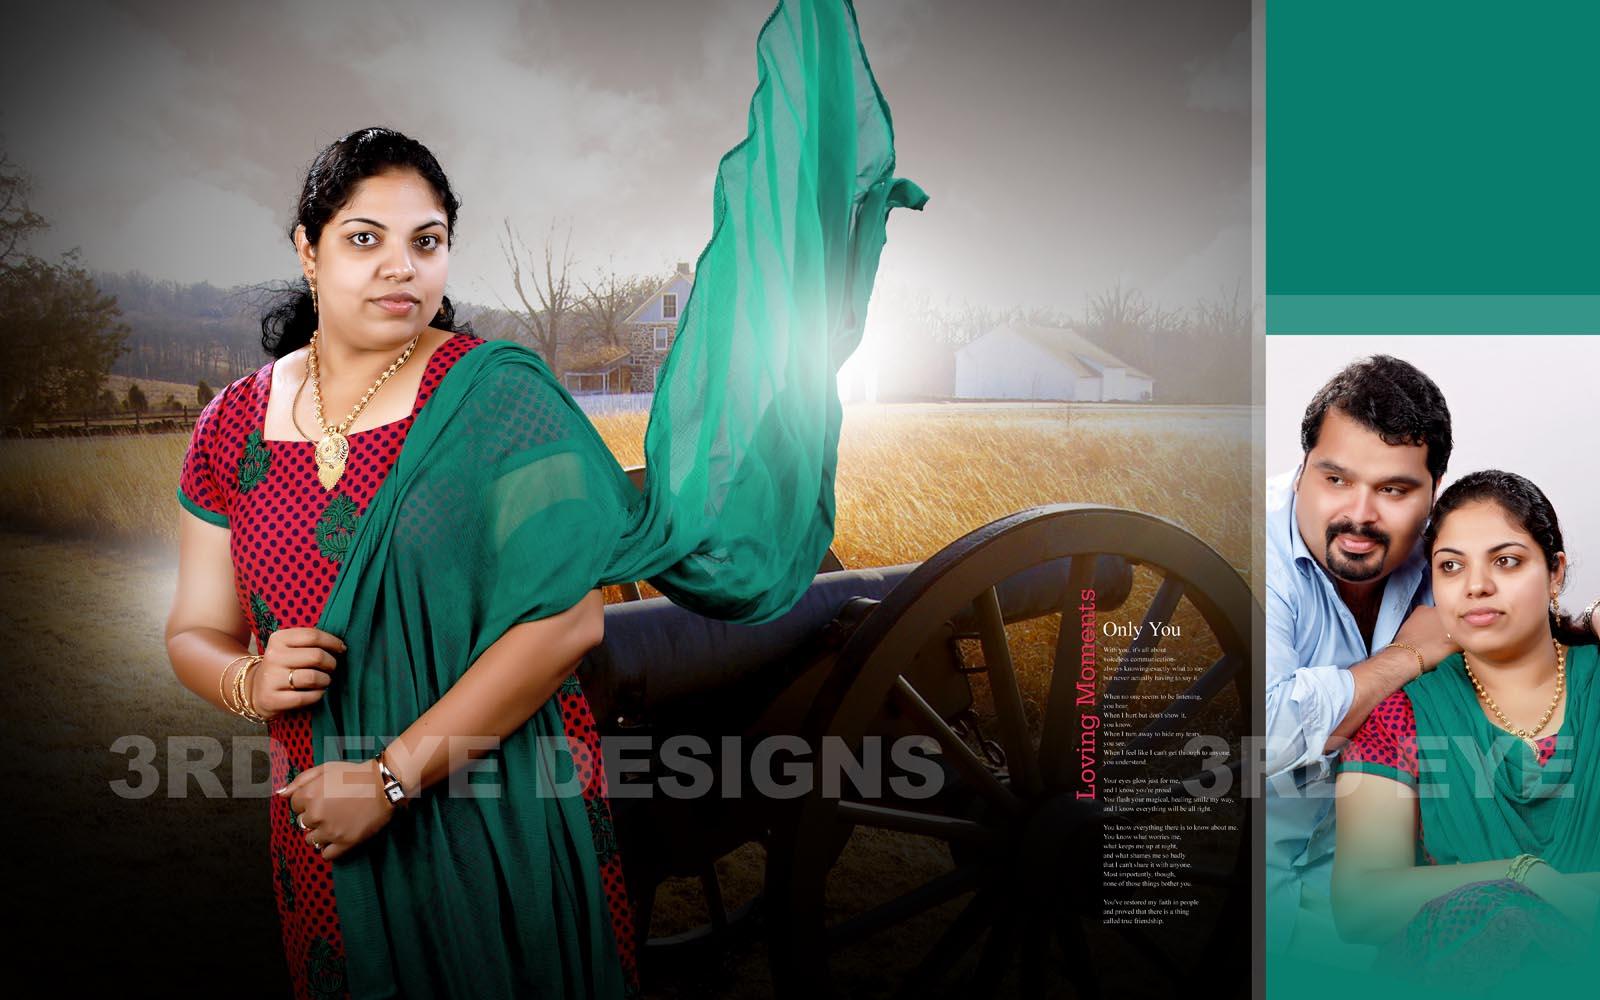 Kerala Wedding Al Design Psd Juve Cenitdelacabrera Co